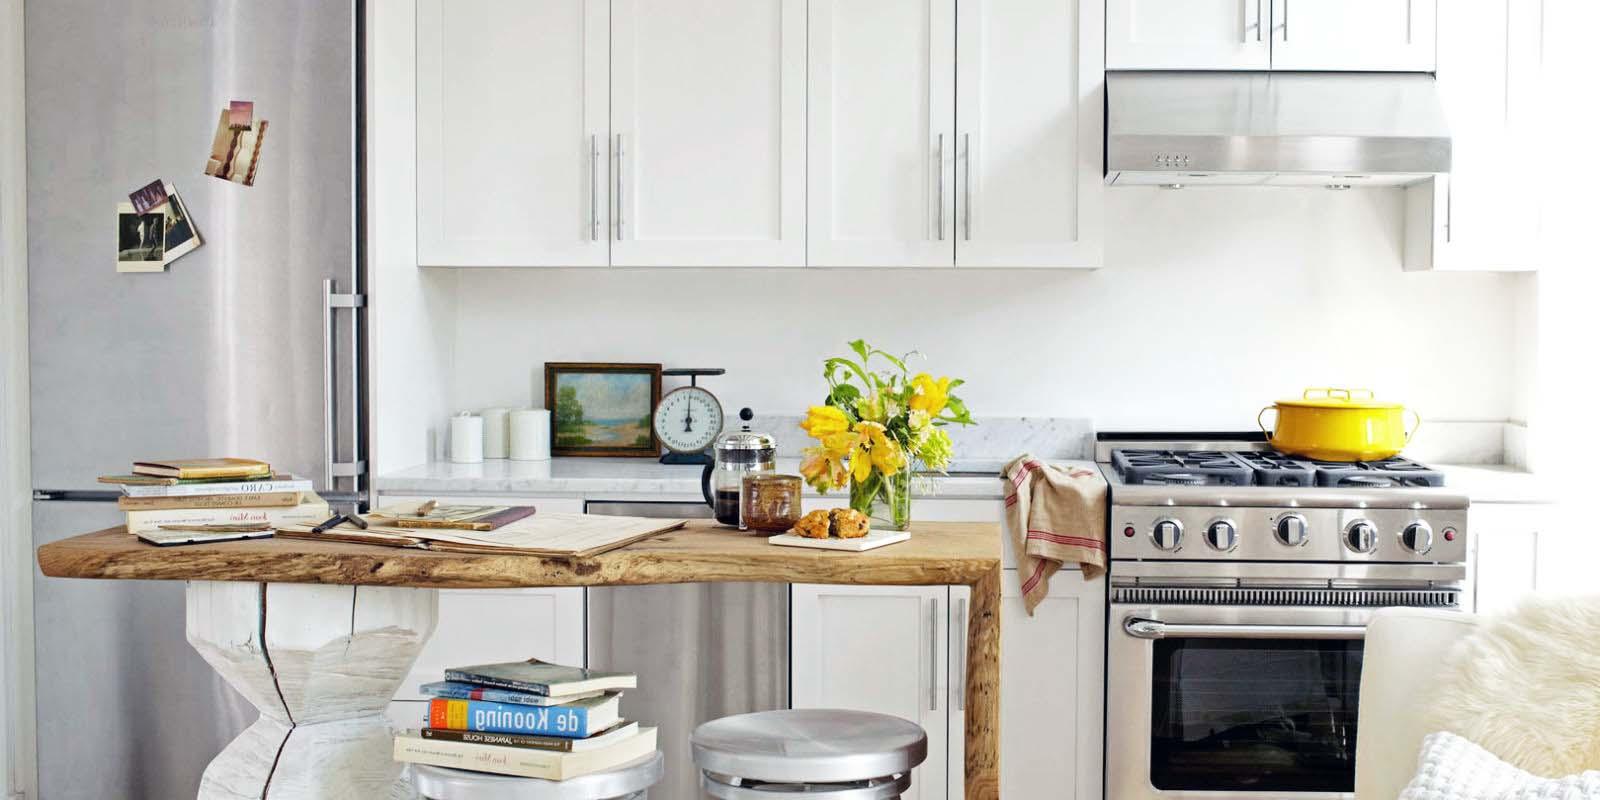 Bagaimana Cara Memaksimalkan Dapur Kecil Anda